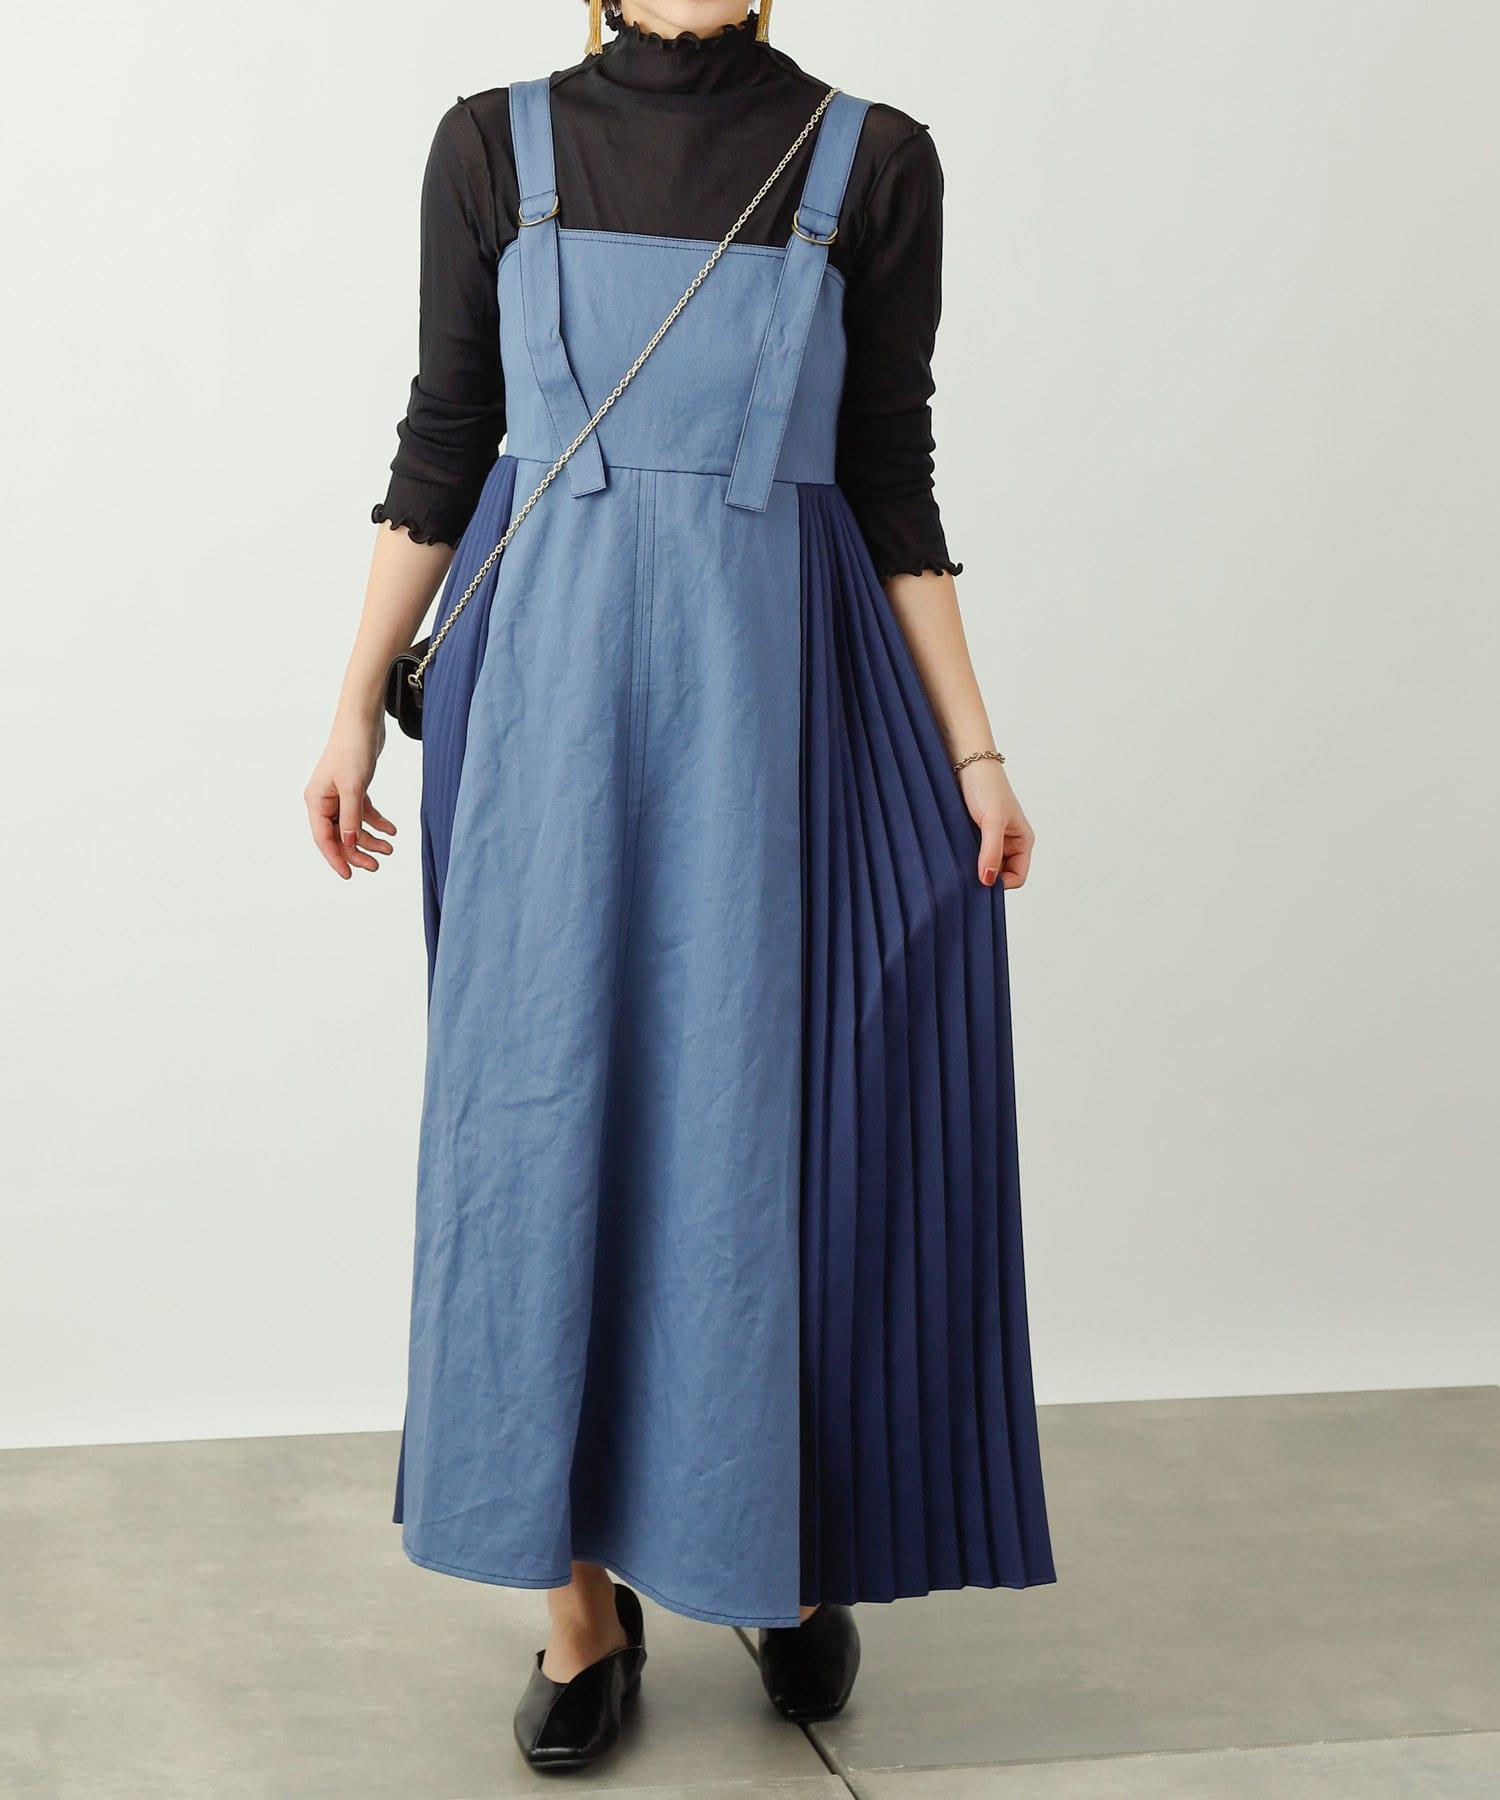 COLONY 2139(コロニー トゥーワンスリーナイン) ツイルサイドプリーツジャンパースカート